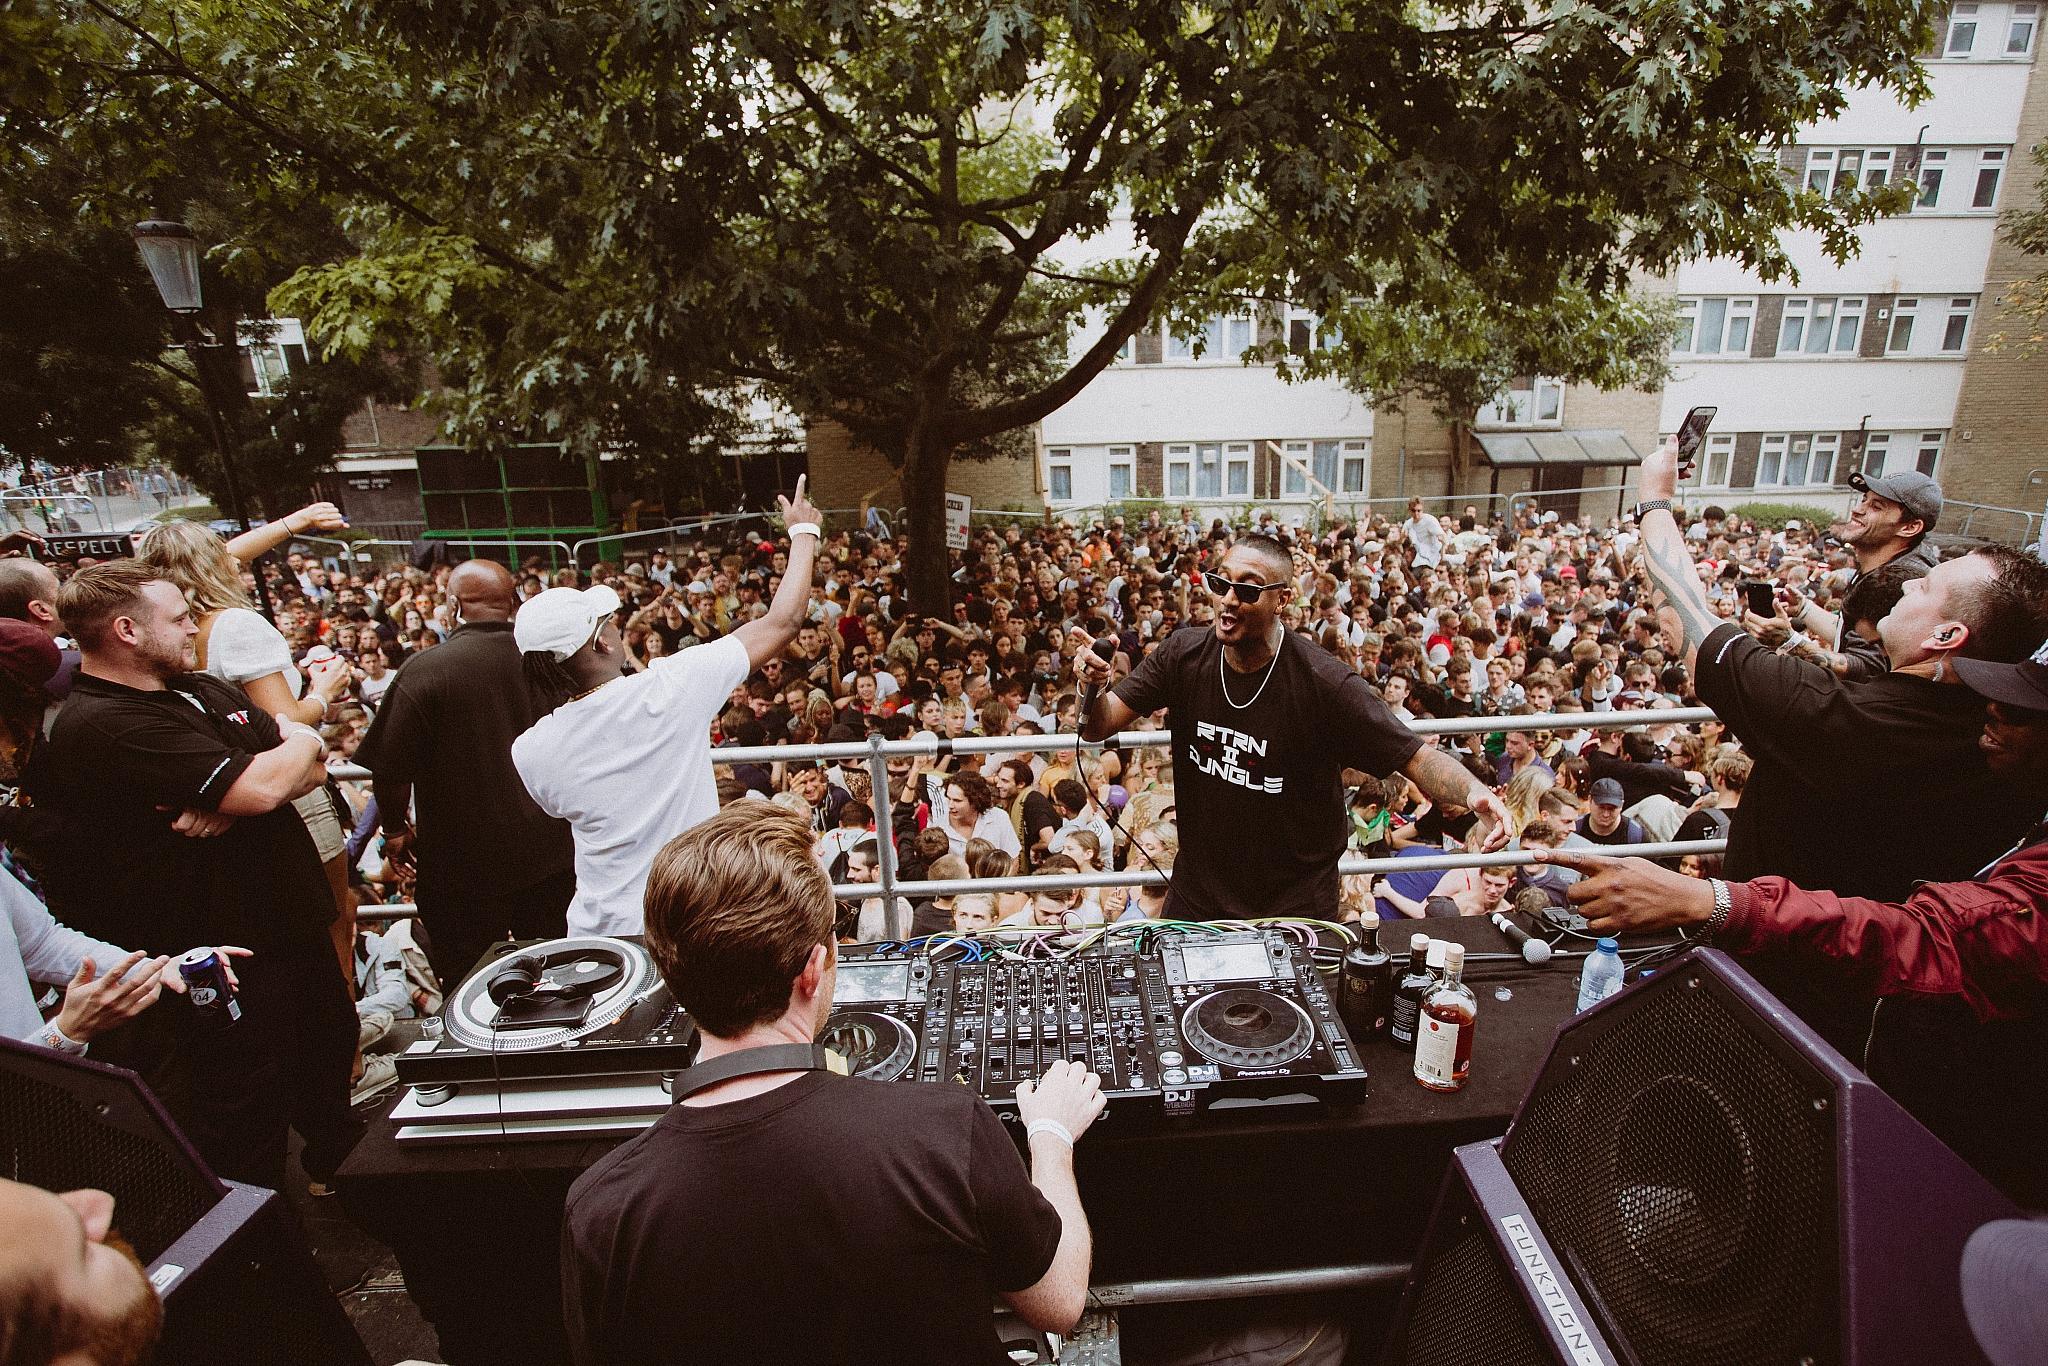 Chase & Status - Carnival - 27th August 2018 by Luke Dyson - IMG_0950 (1).jpg